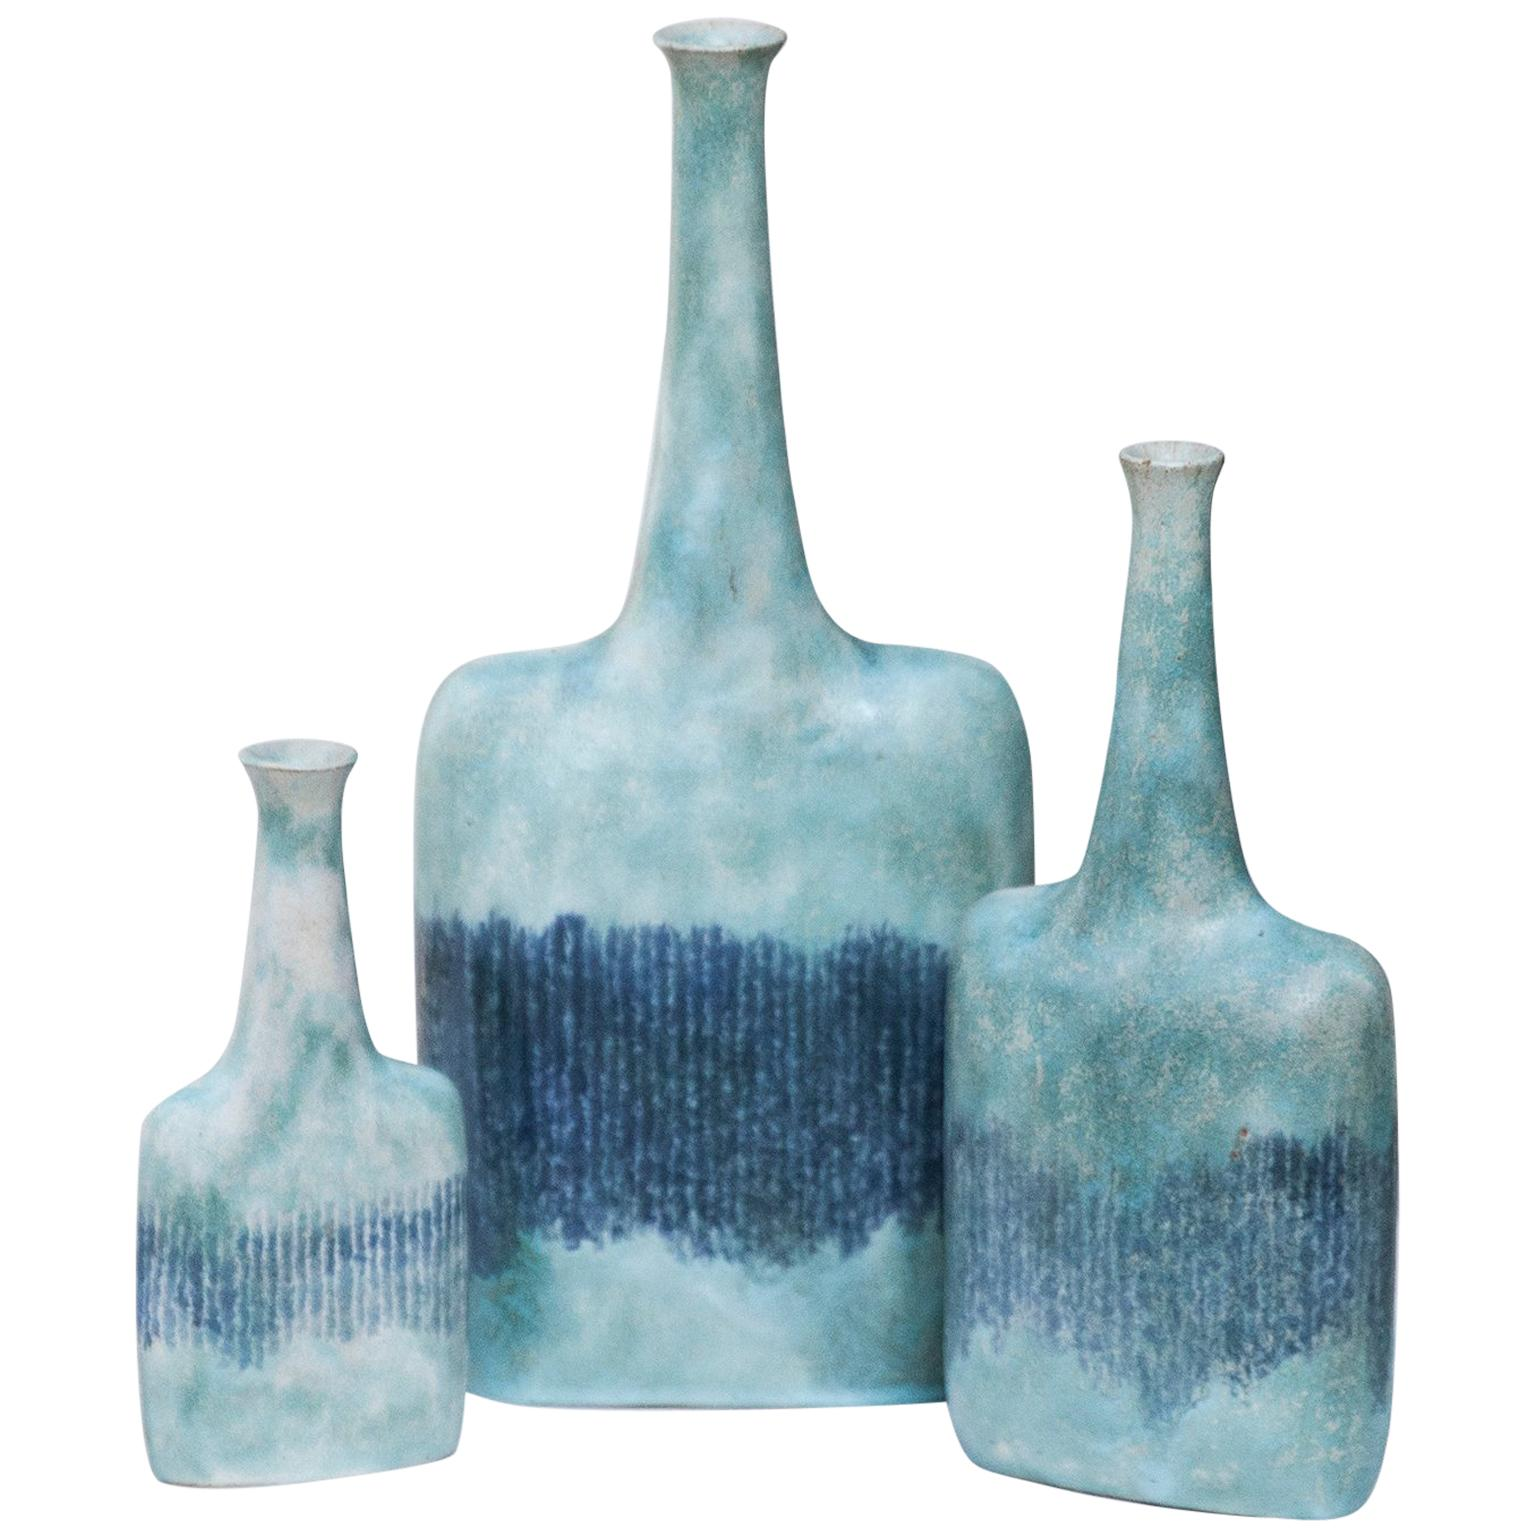 Huge Bruno Gambone Art Pottery Light Green Vase Set of 3